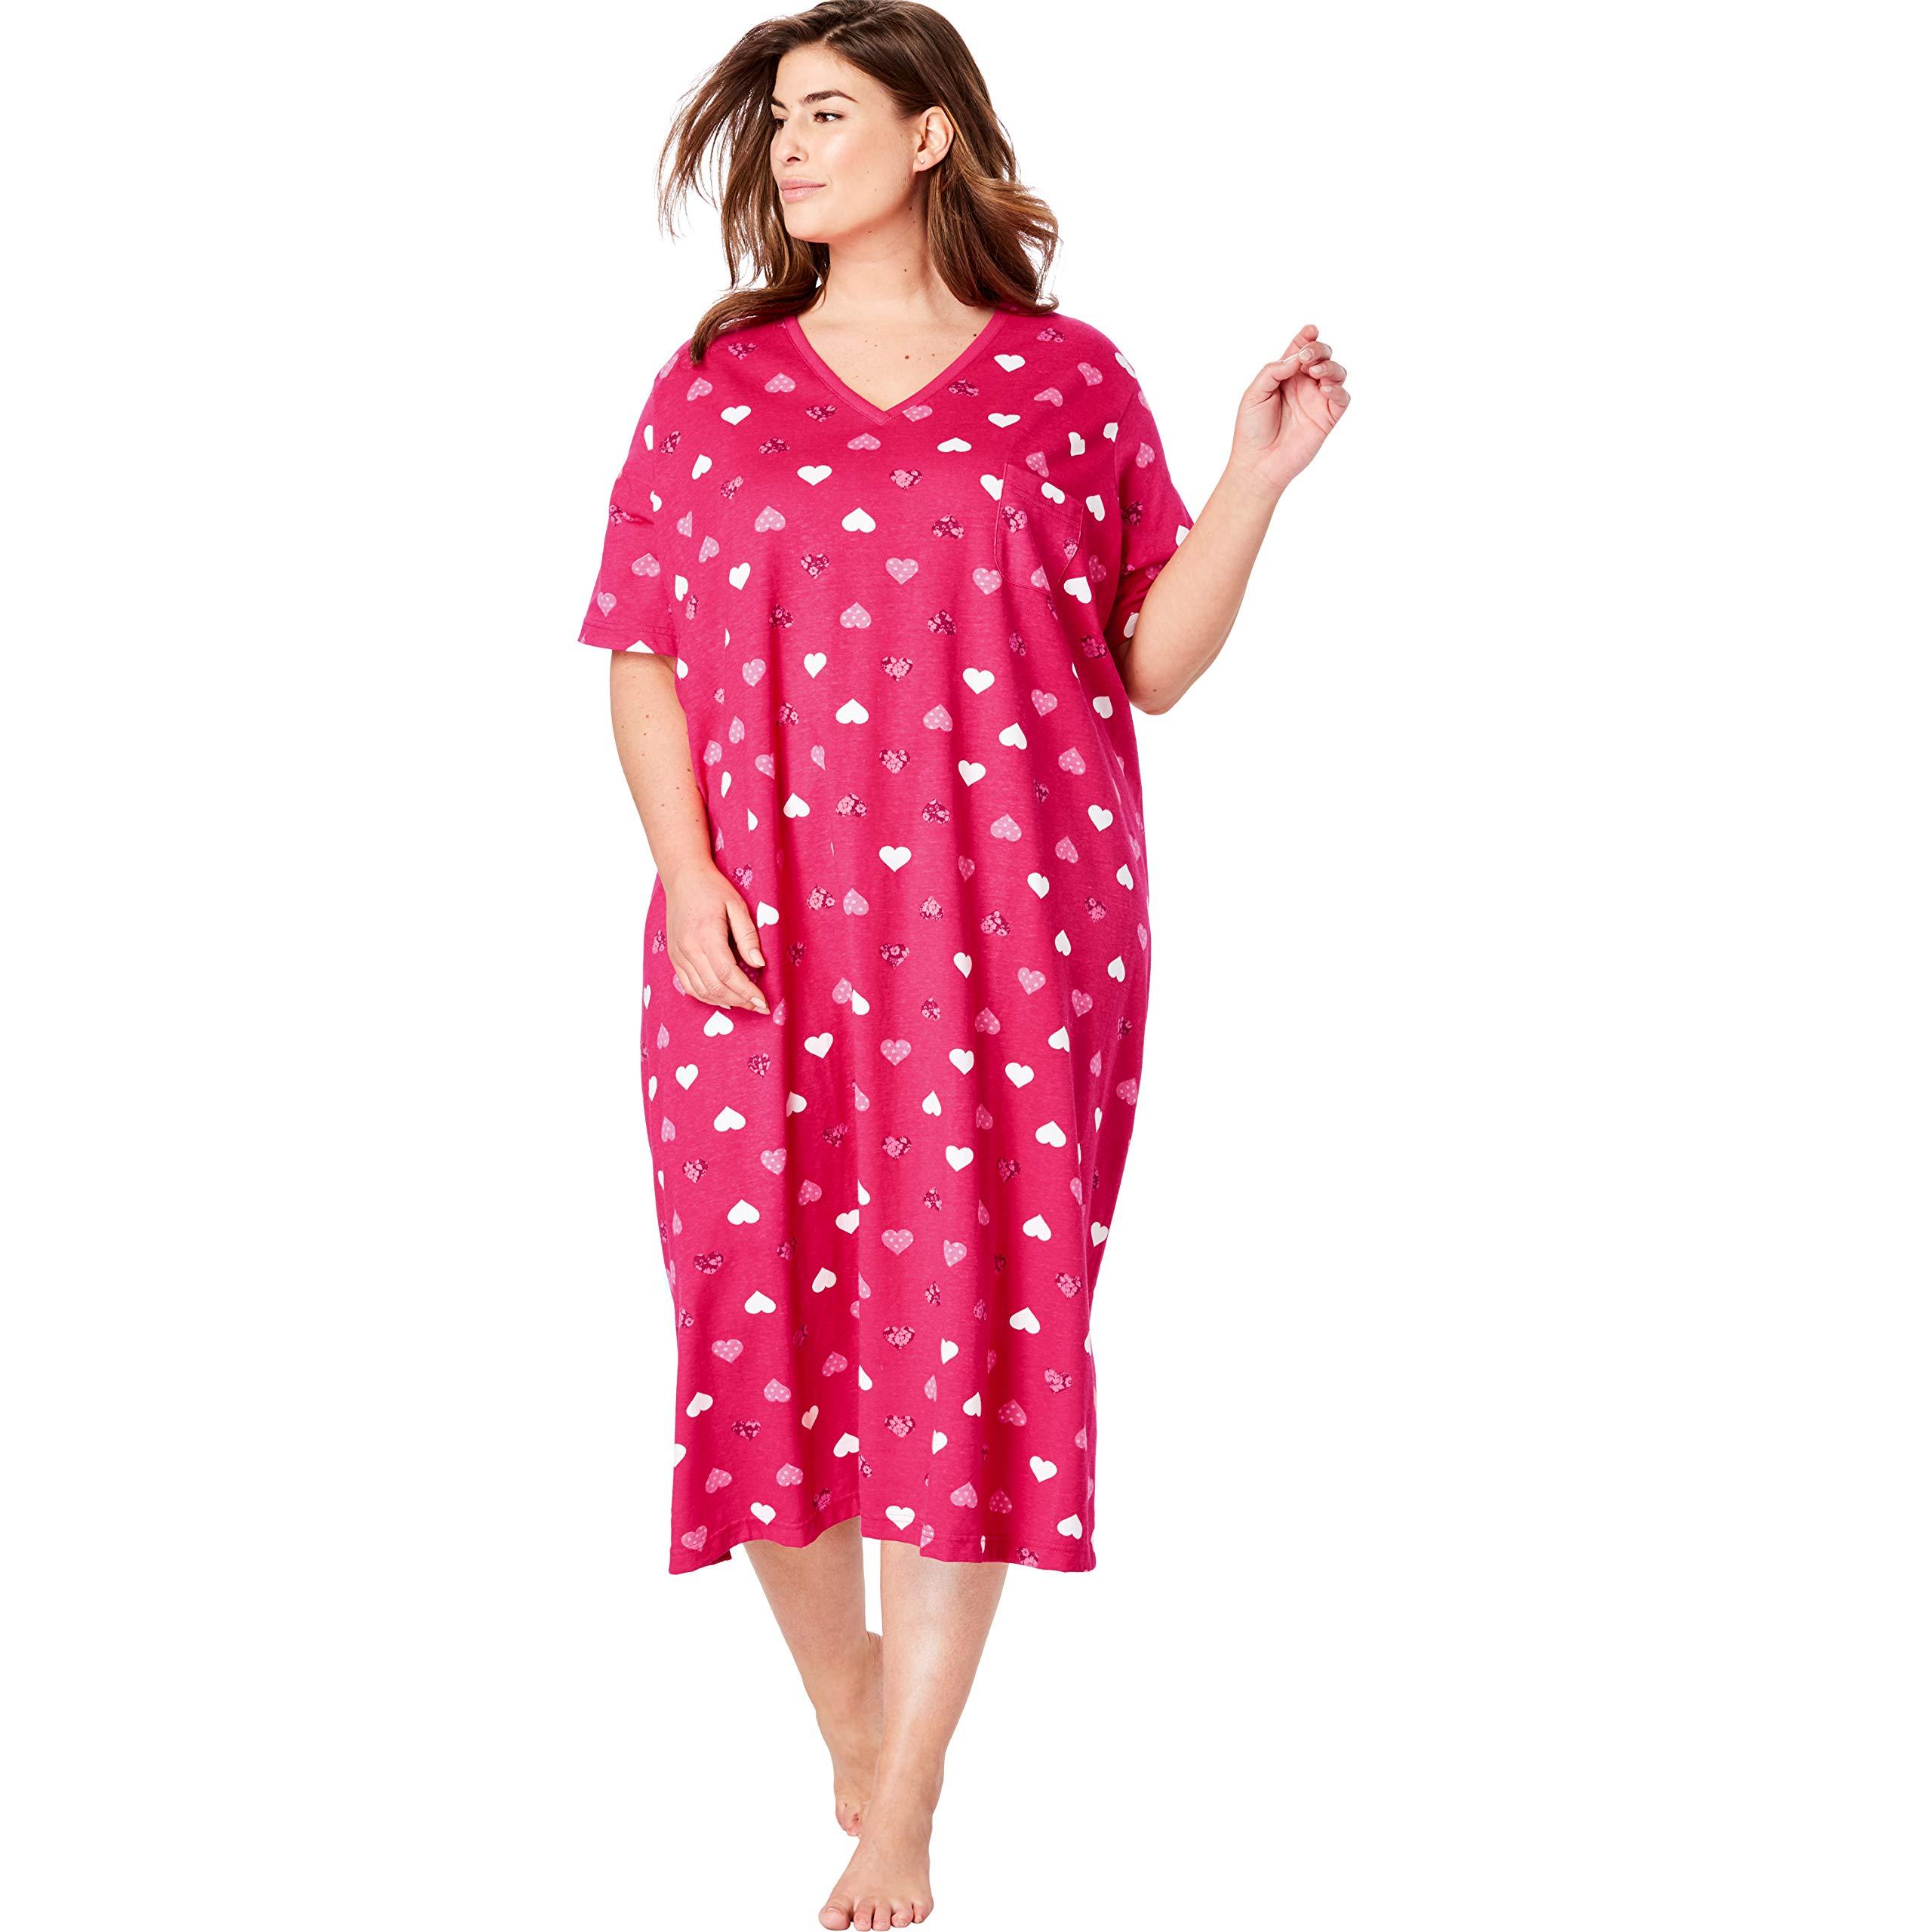 Dreams & Co. Women's Plus Size Long Print Sleepshirt - Radiant Pink Hearts, 1X/2X by Dreams & Co.